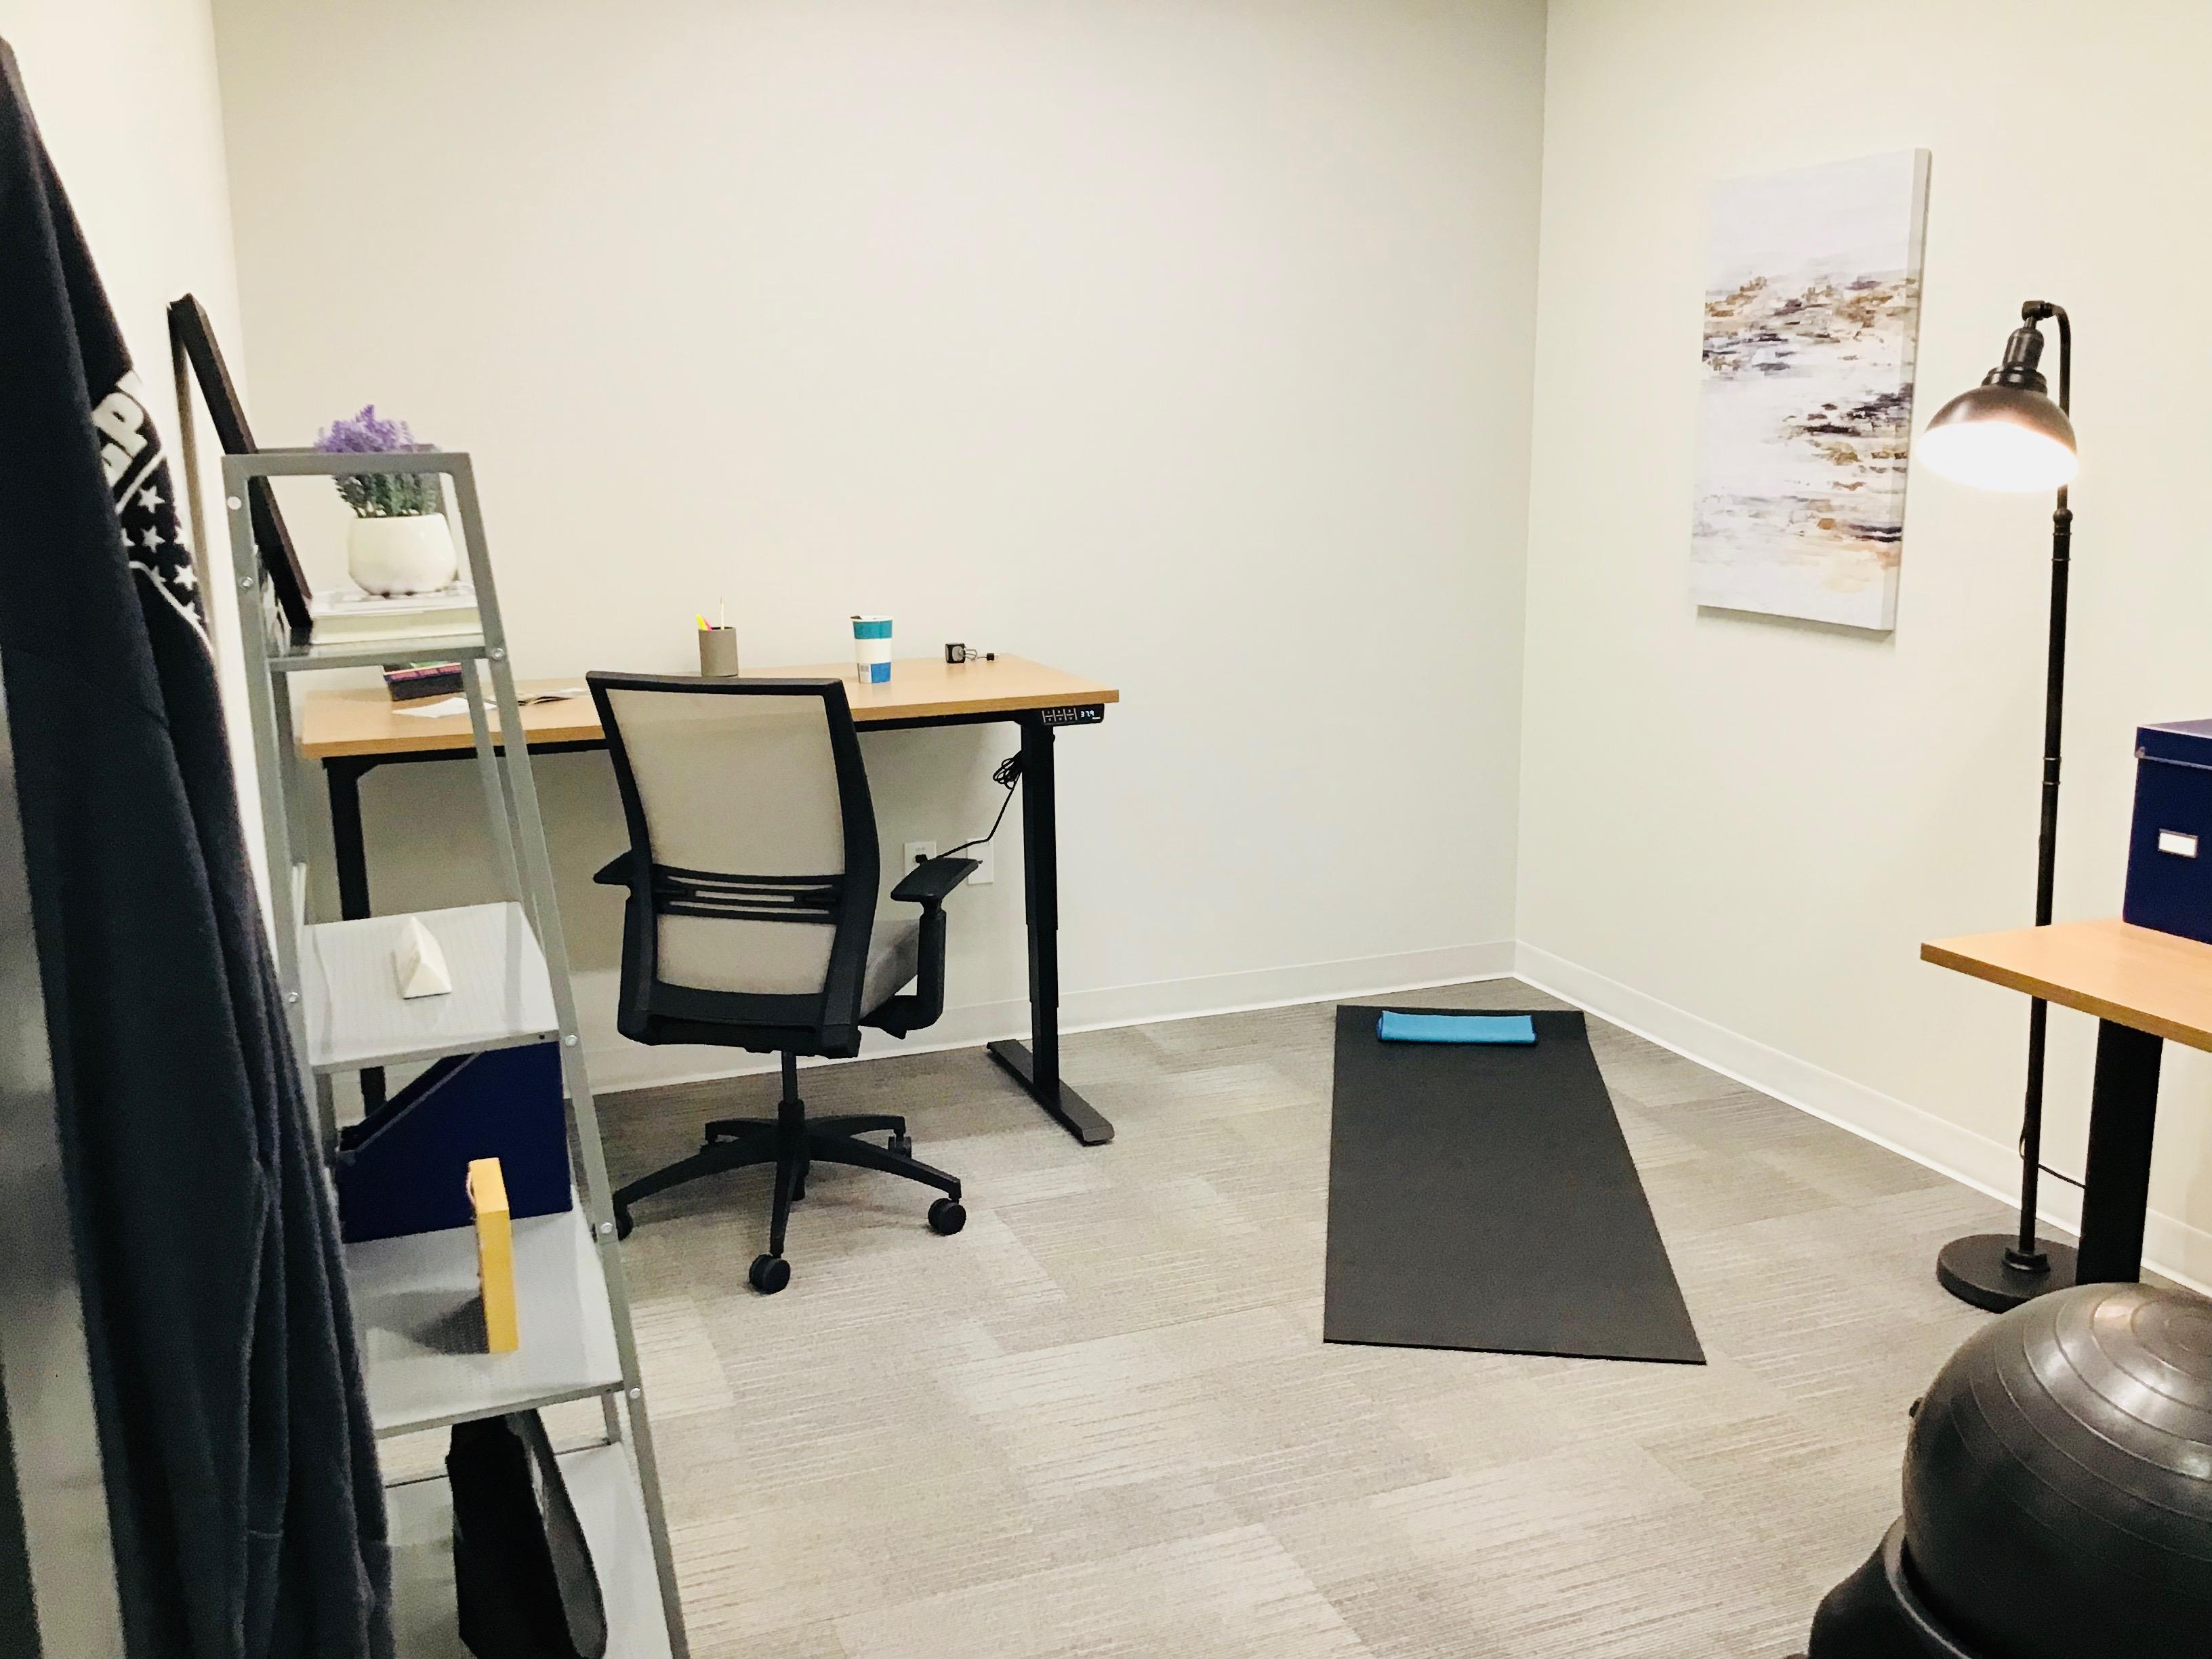 Serendipity Labs Alpharetta - 1 - 2 Person Office